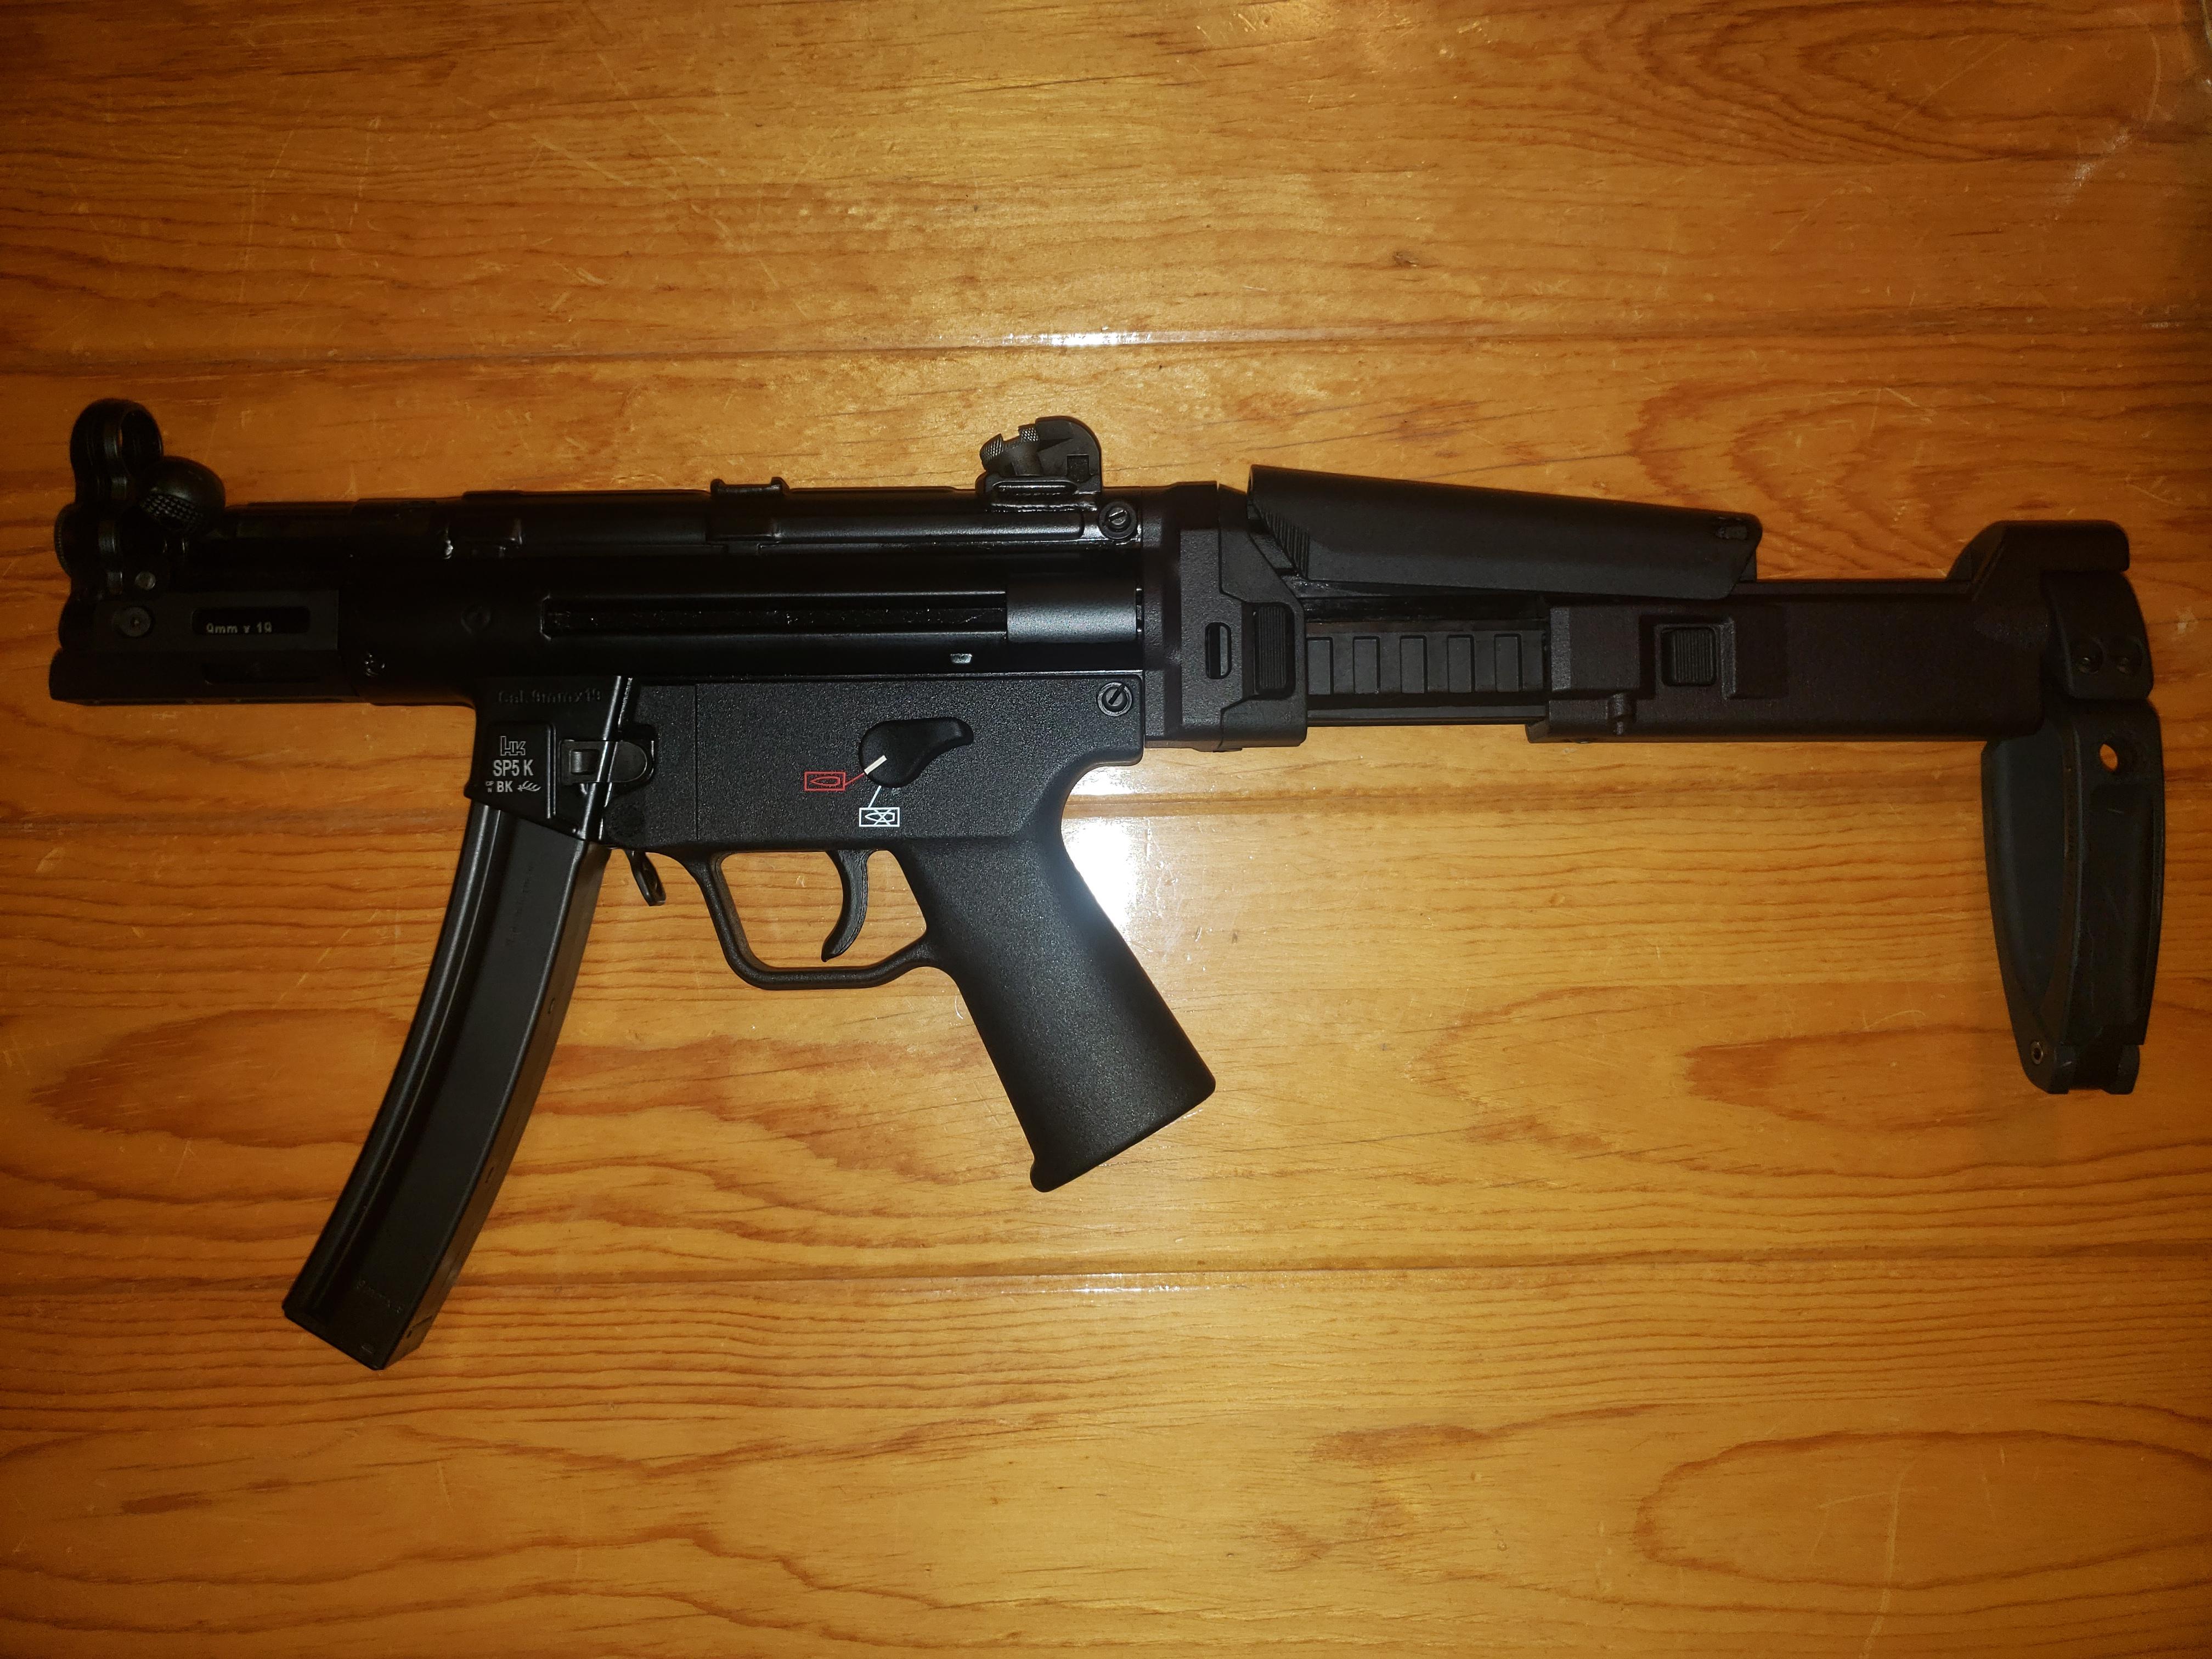 MP5 ACR Stock Adaptors In Production-20200226_182147_1582760082077.jpg